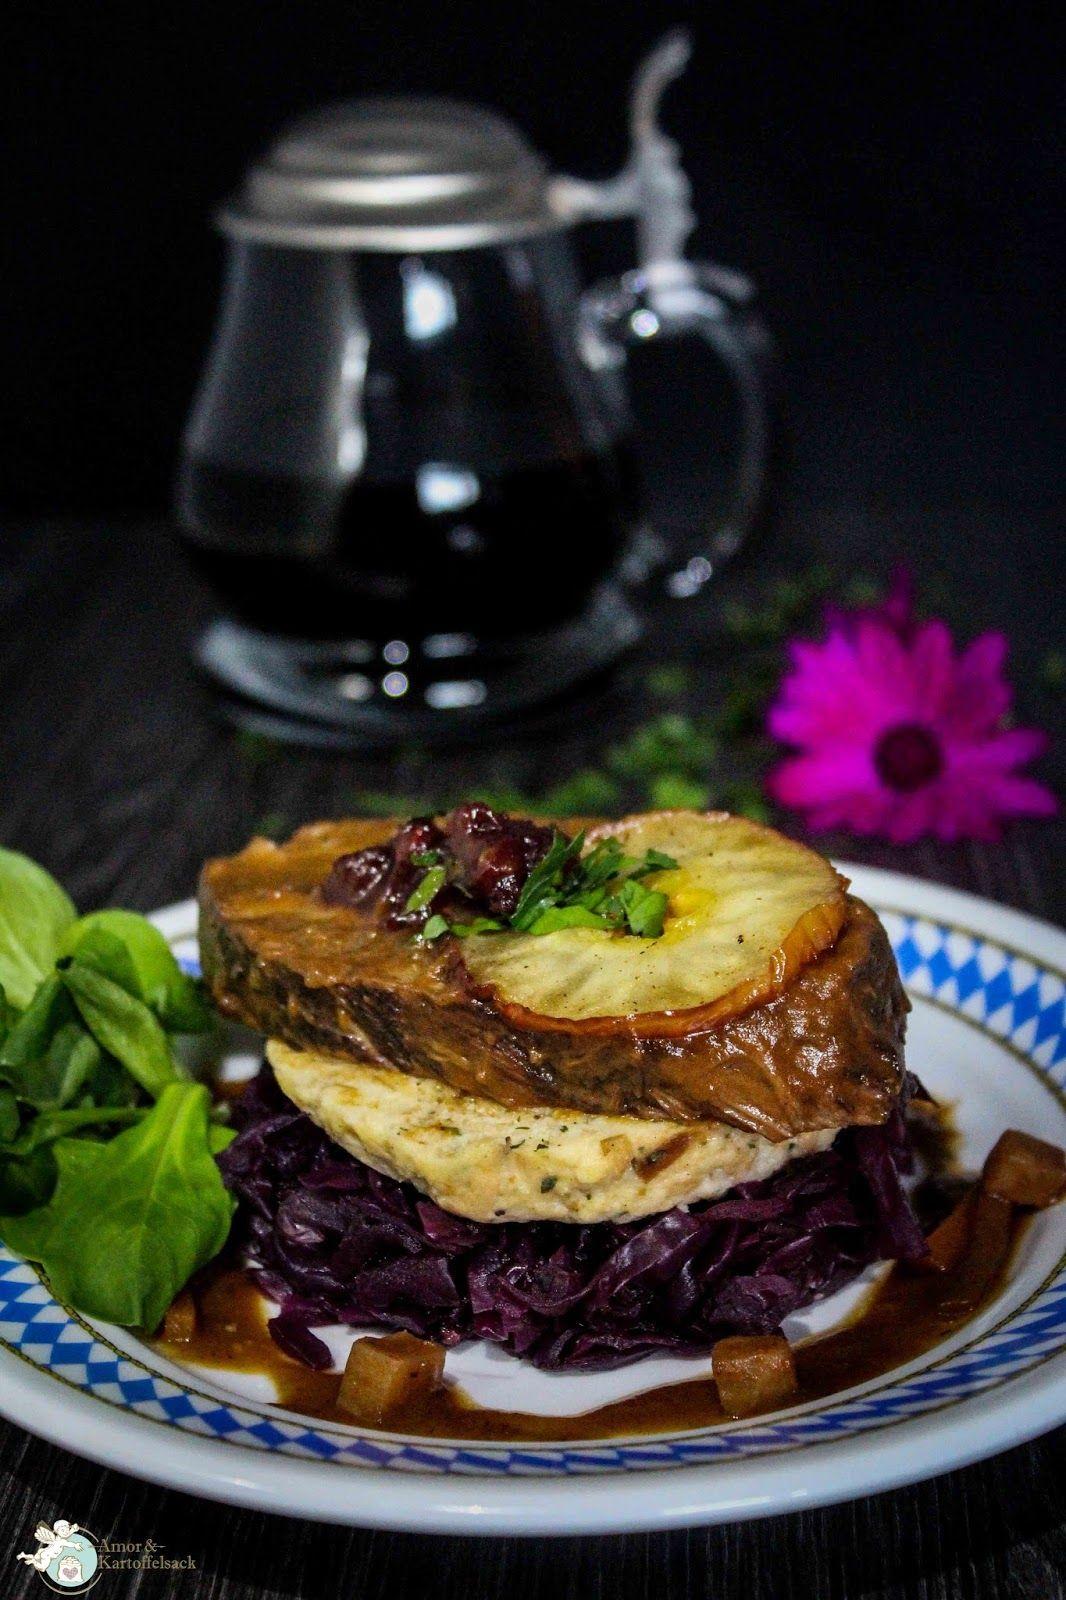 Böfflamott - Boeuf la mode (beef) | Bavarian food | Pinterest ...